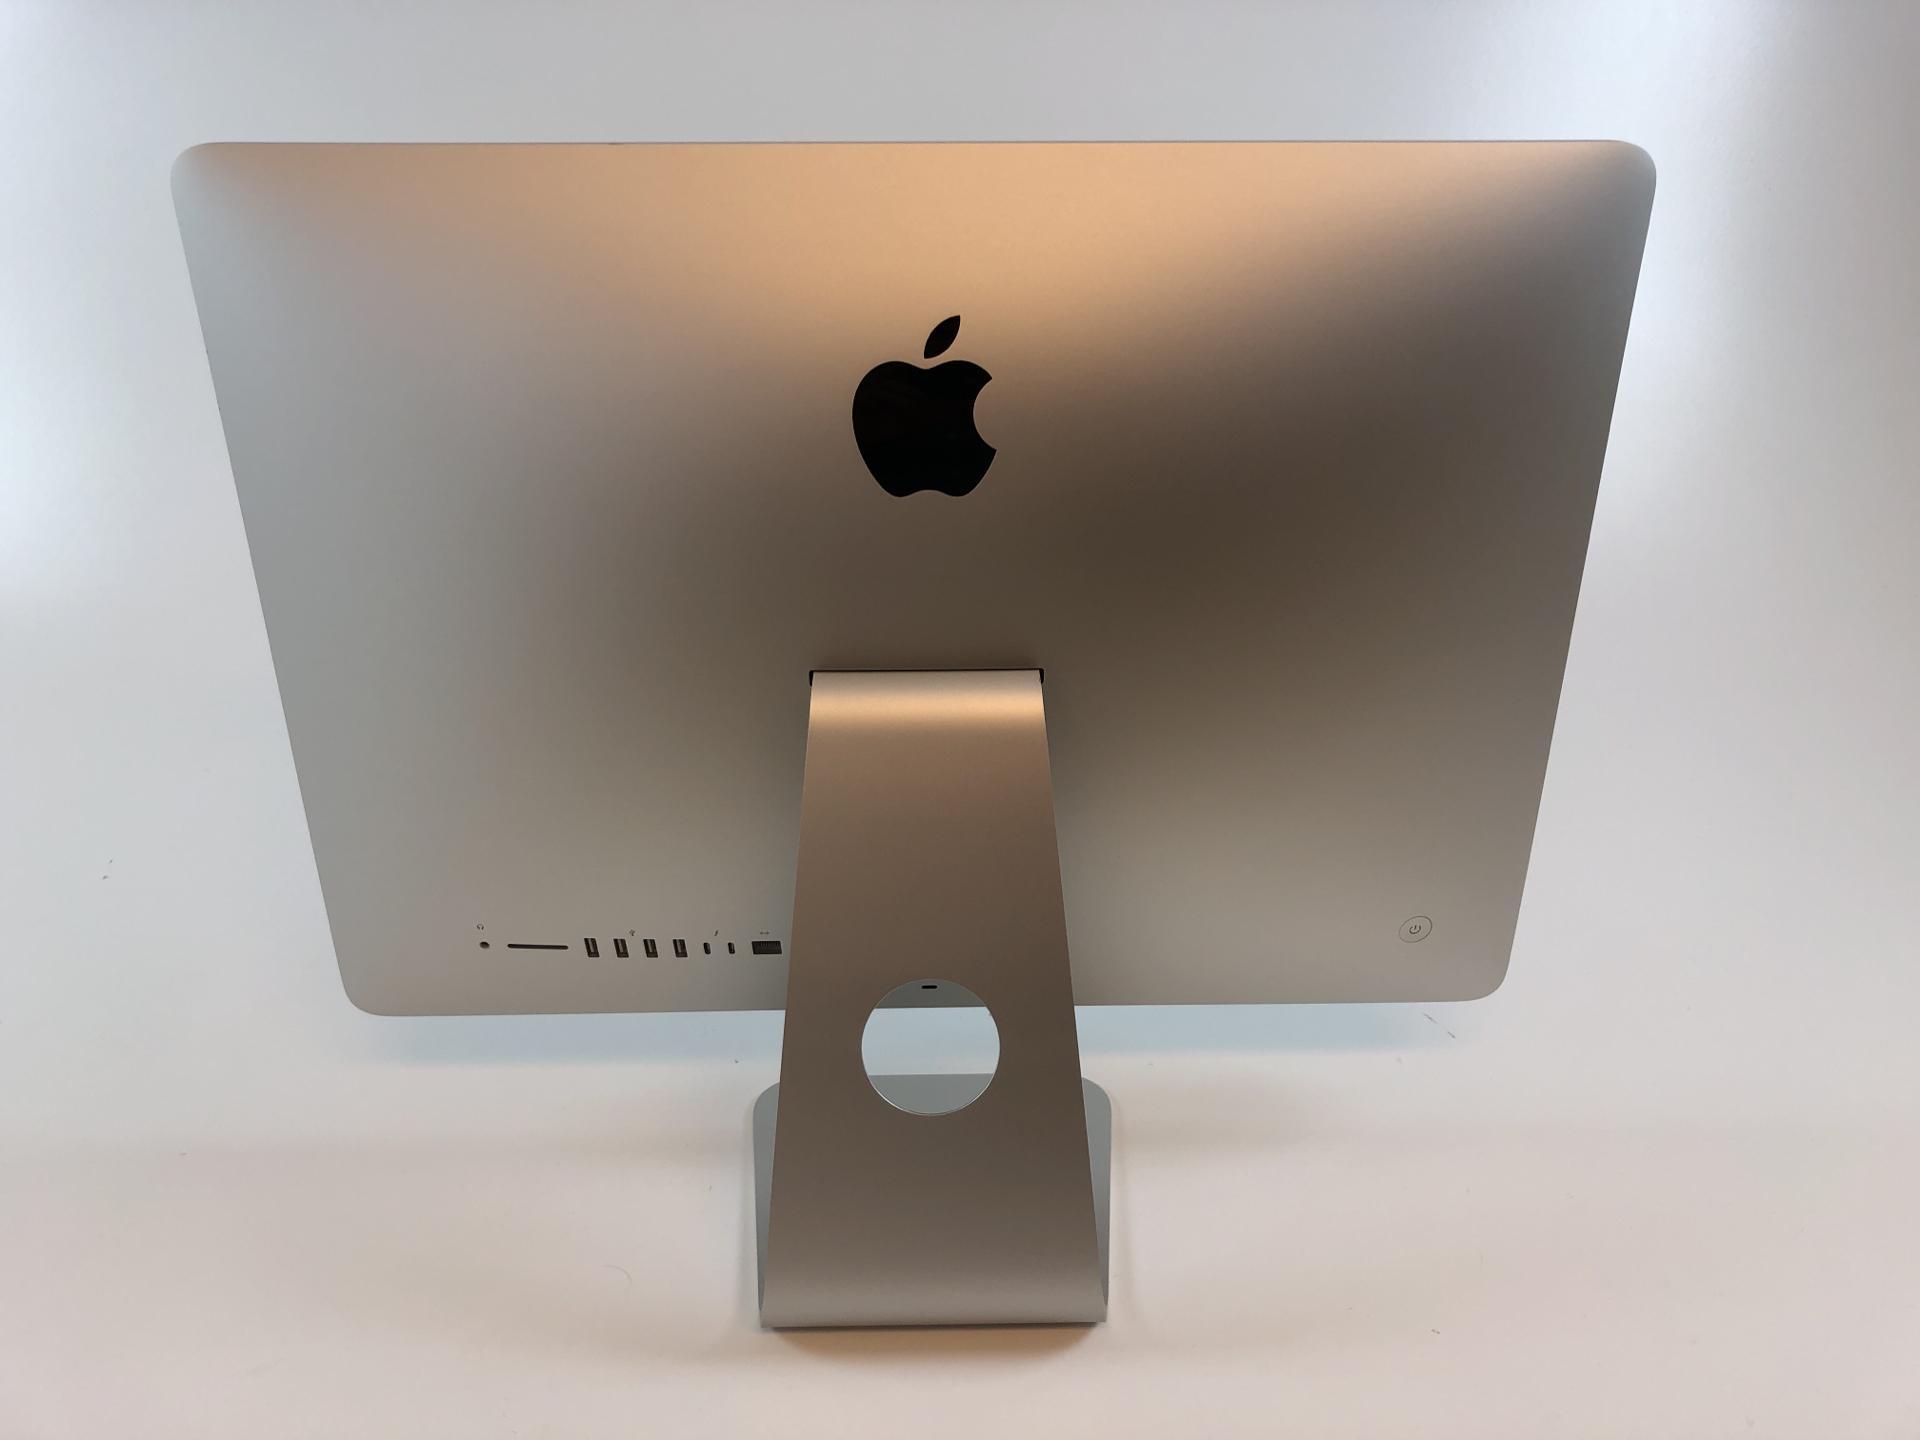 "iMac 21.5"" Mid 2017 (Intel Core i5 2.3 GHz 8 GB RAM 1 TB HDD), Intel Core i5 2.3 GHz, 8 GB RAM, 1 TB HDD, Afbeelding 3"